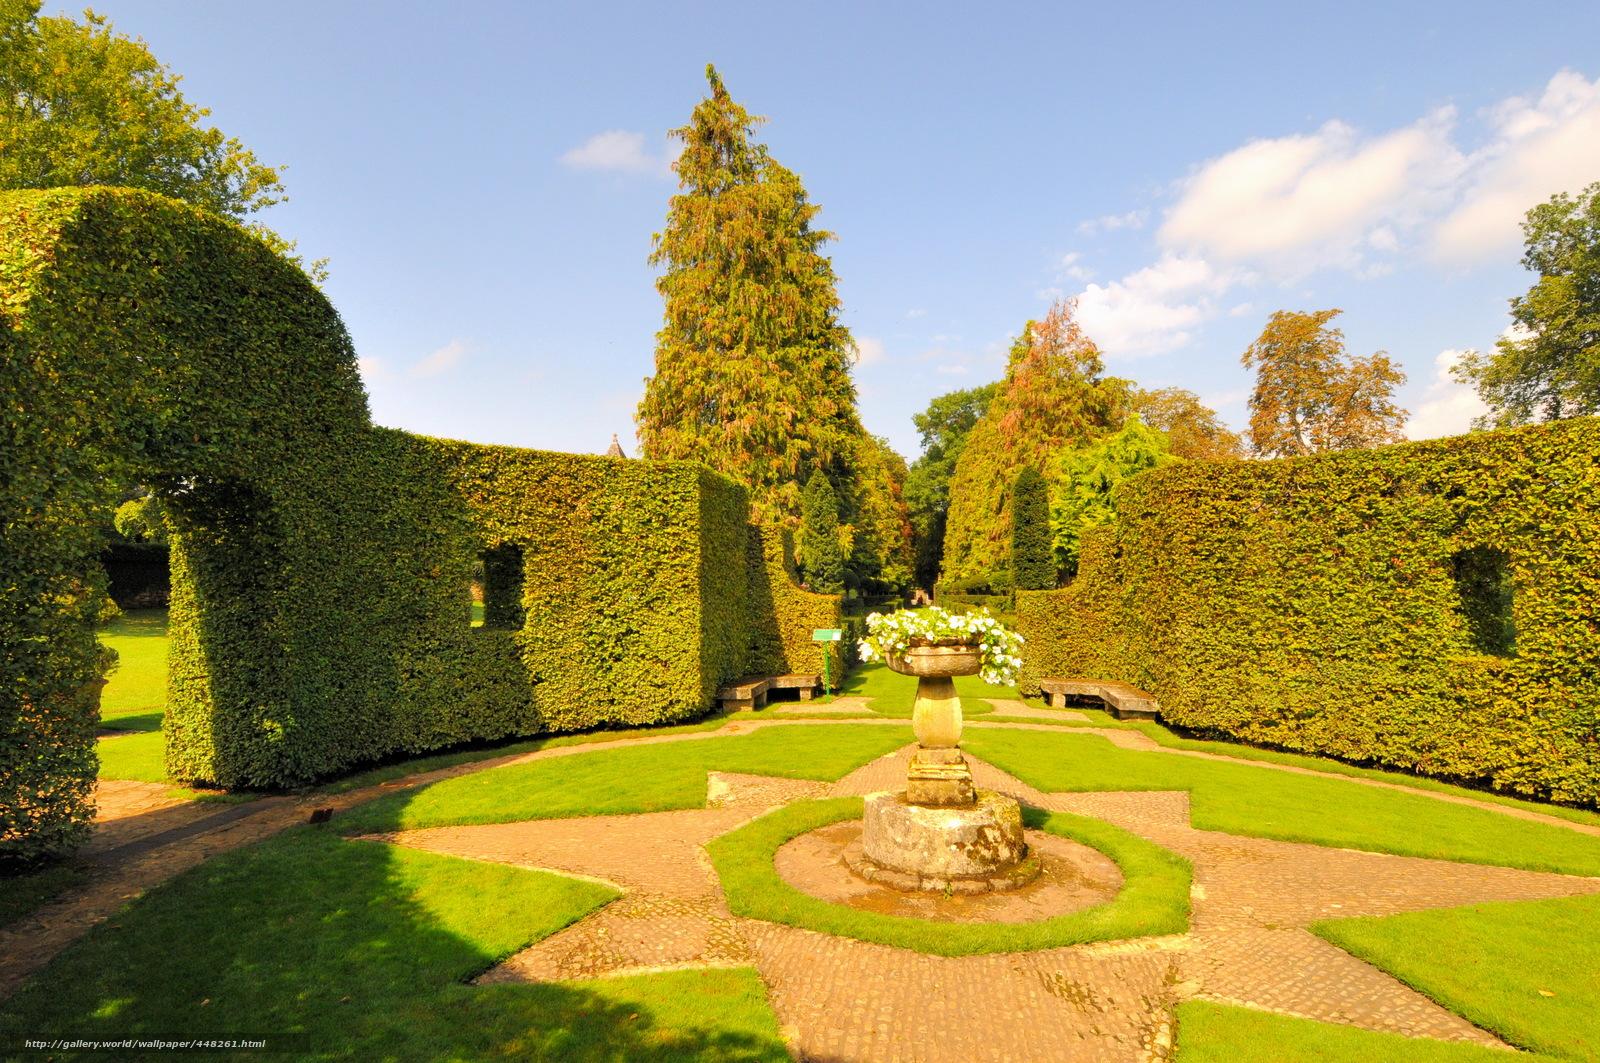 Tlcharger fond d 39 ecran jardin france jardins d 39 eyrignac - Jardin du manoir d eyrignac ...